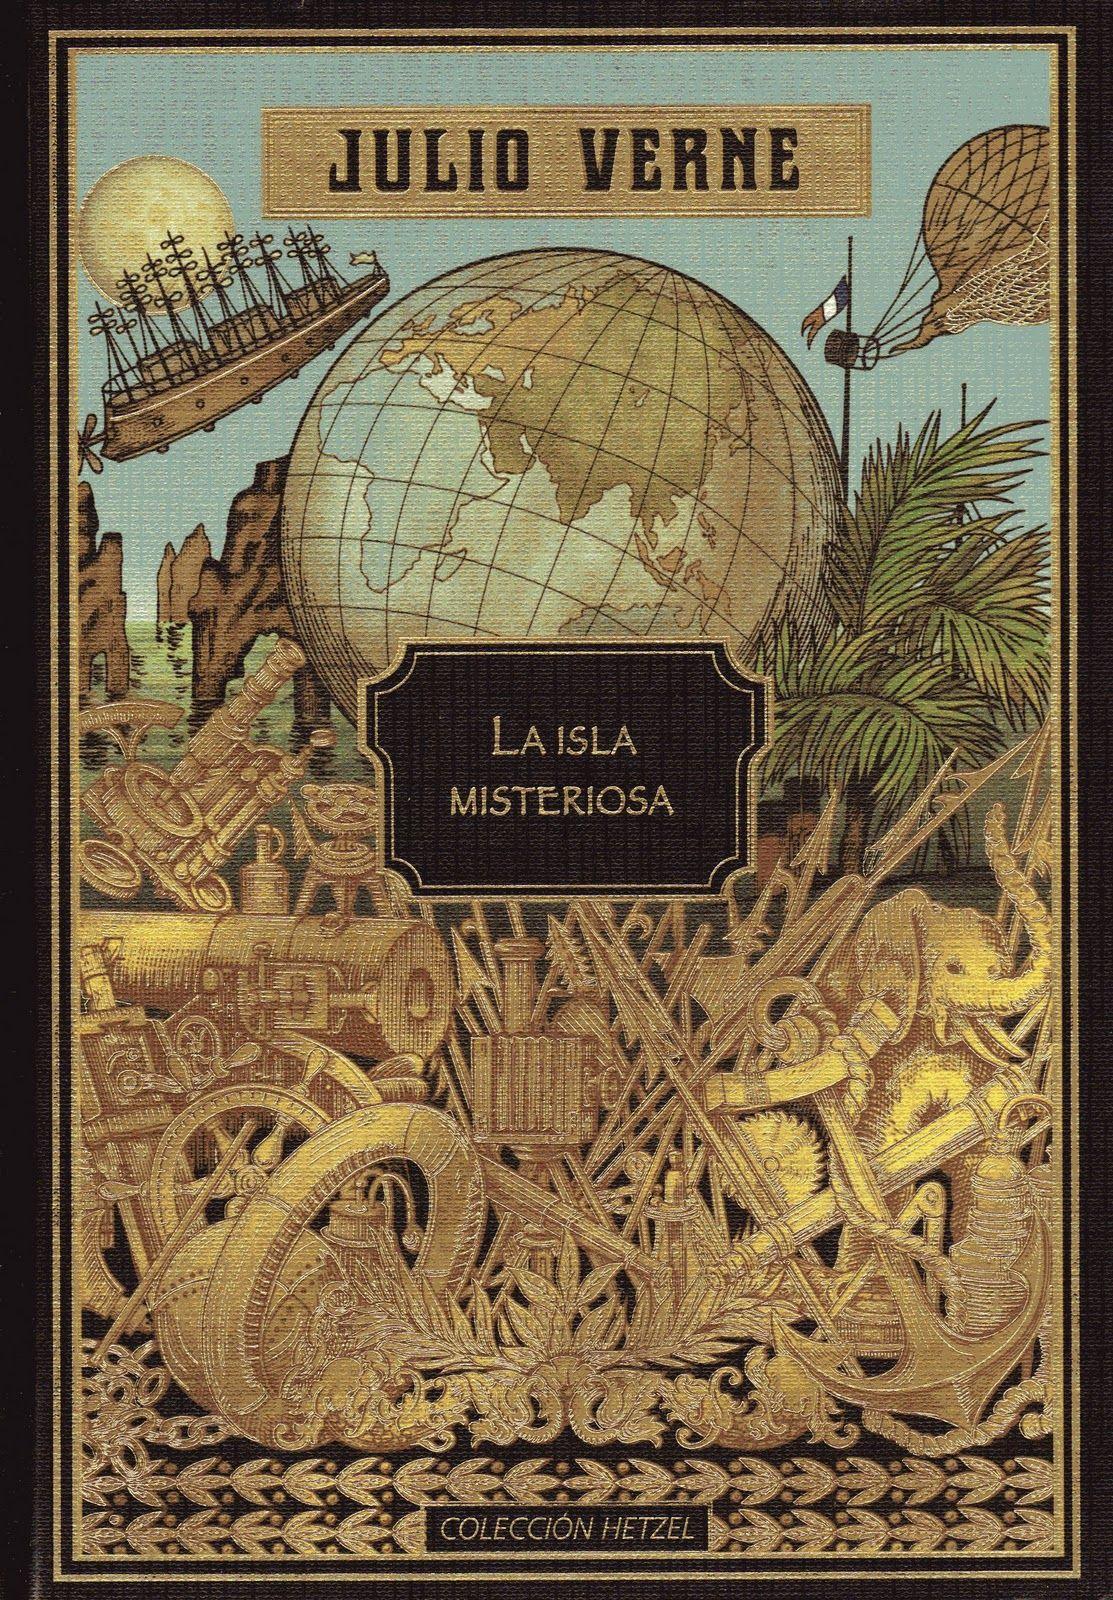 La Isla Misteriosa 1113 1600 Julio Verne Billetes De Loteria Julio